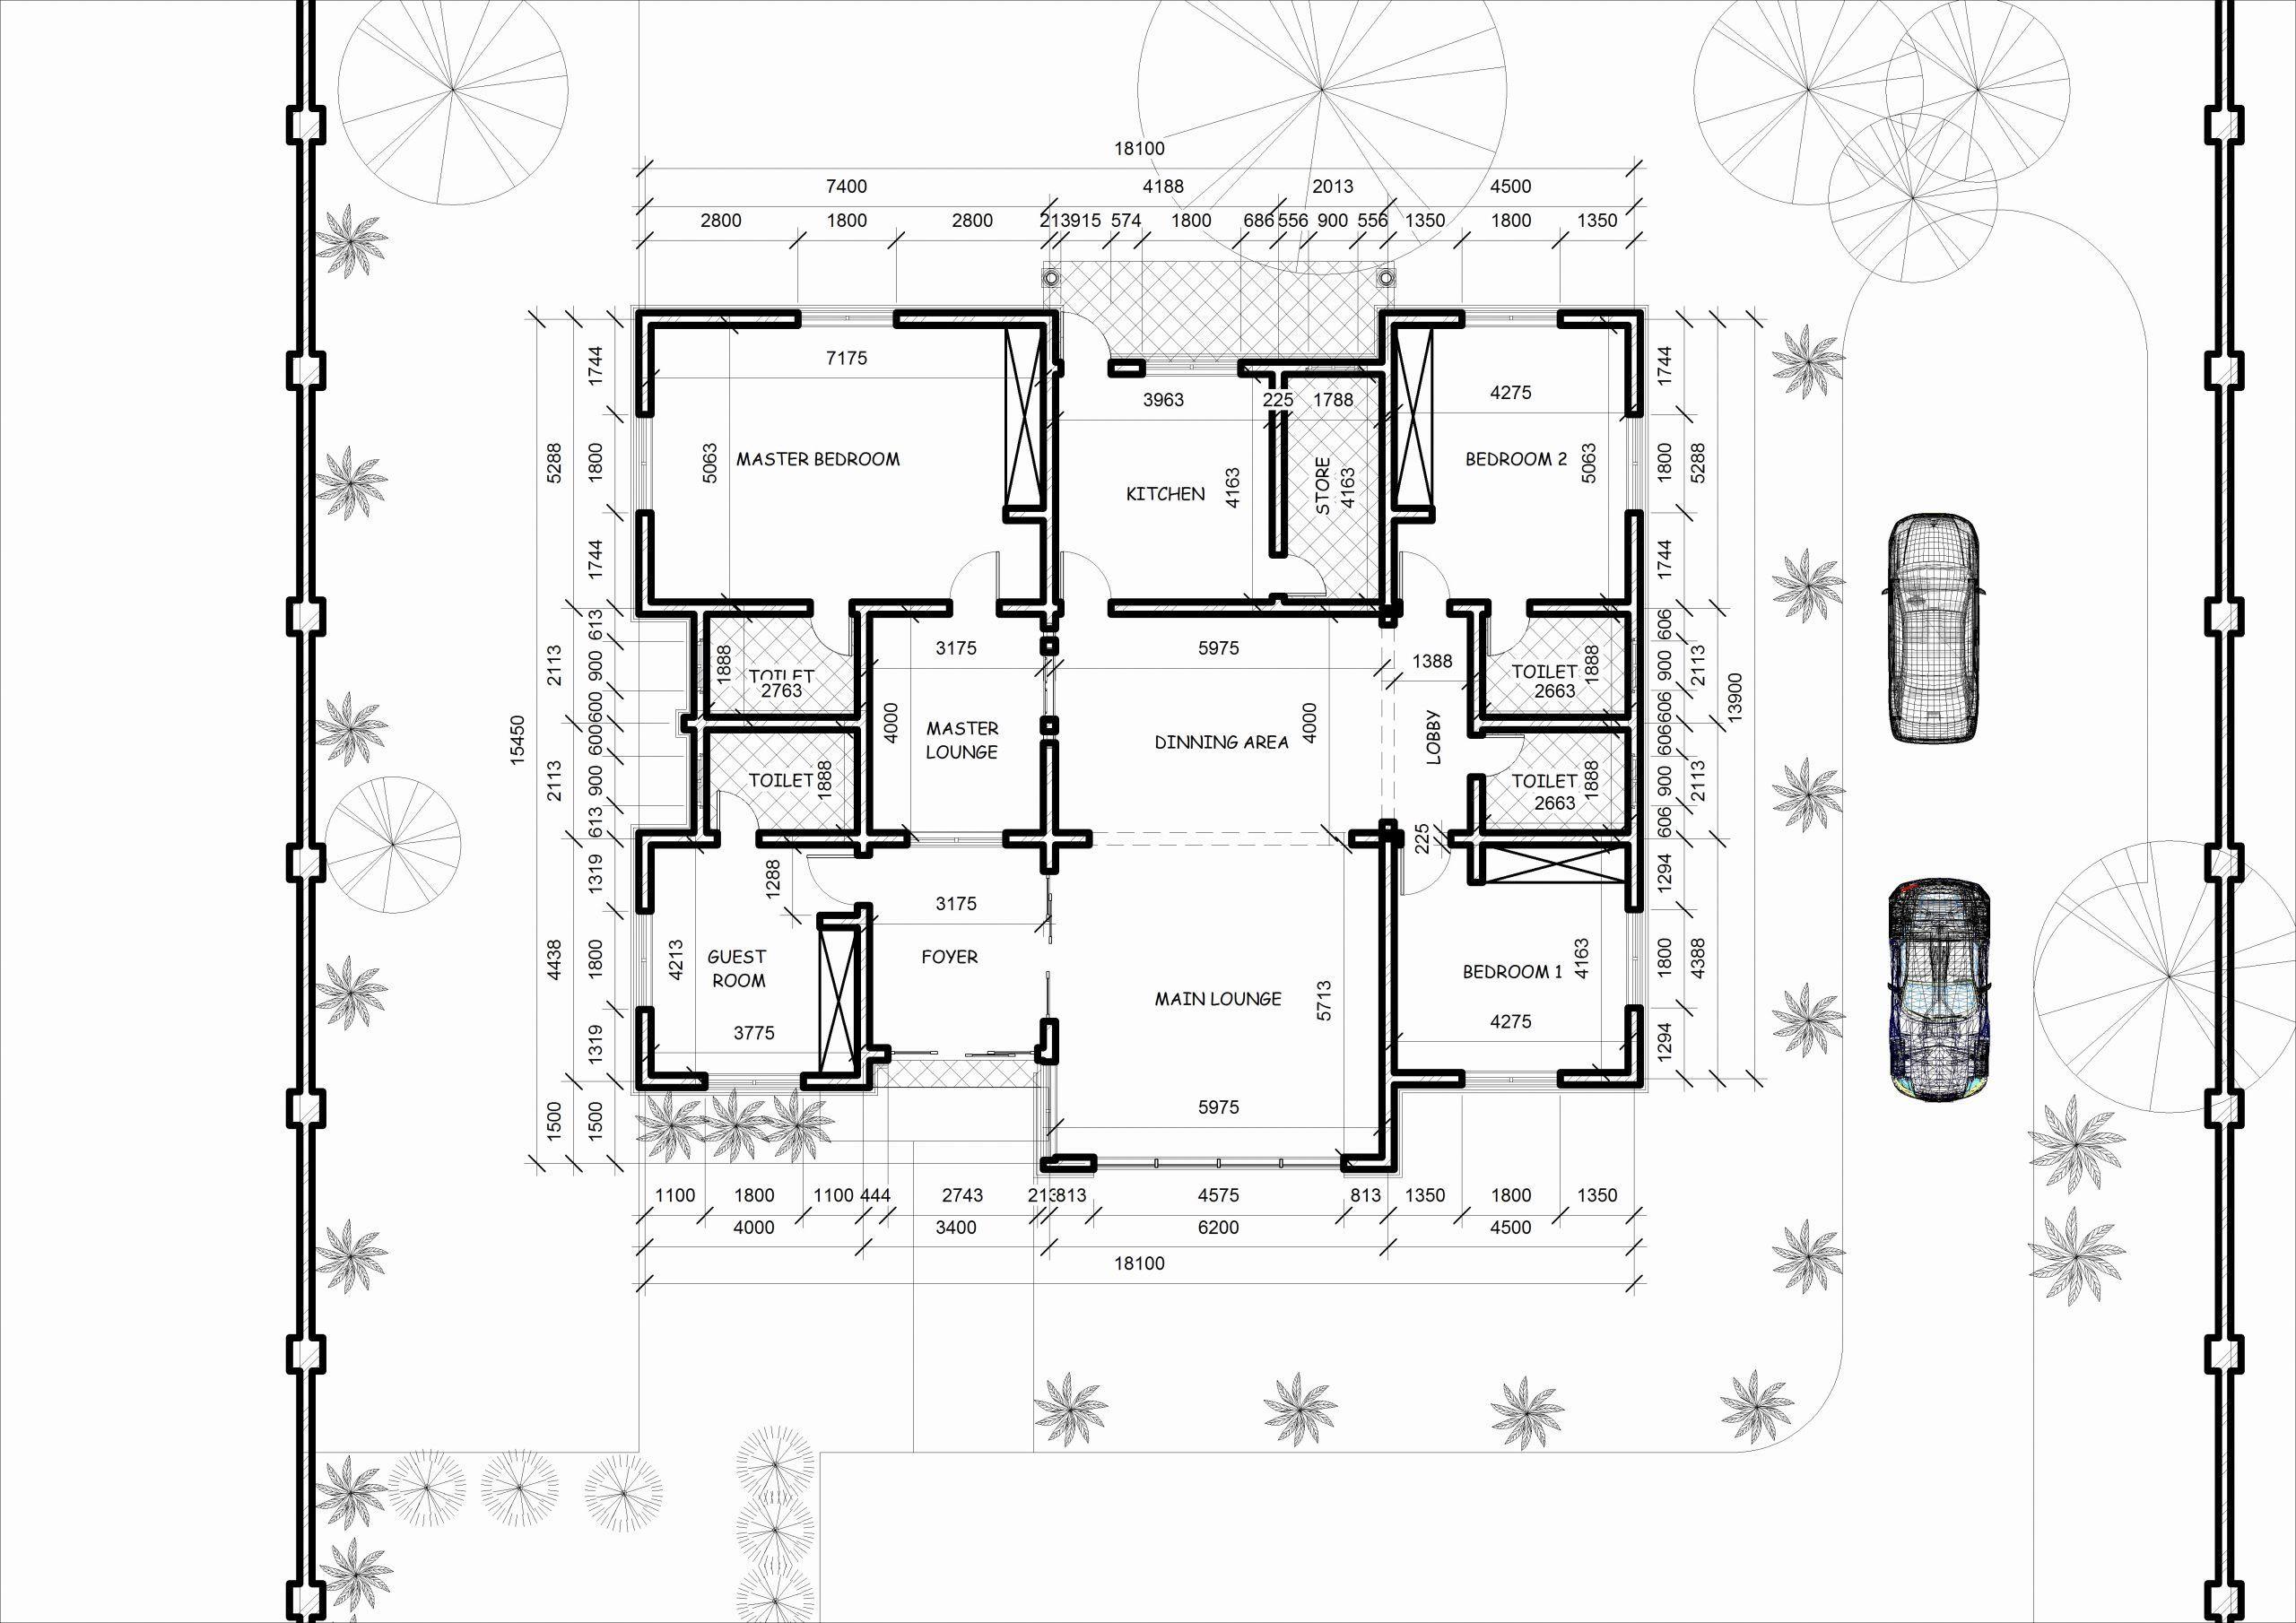 4 Bedroom Bungalow House Plans Fresh 4 Bedroom Bungalow In 2020 Bungalow Floor Plans Bungalow Style House Plans Bungalow House Floor Plans